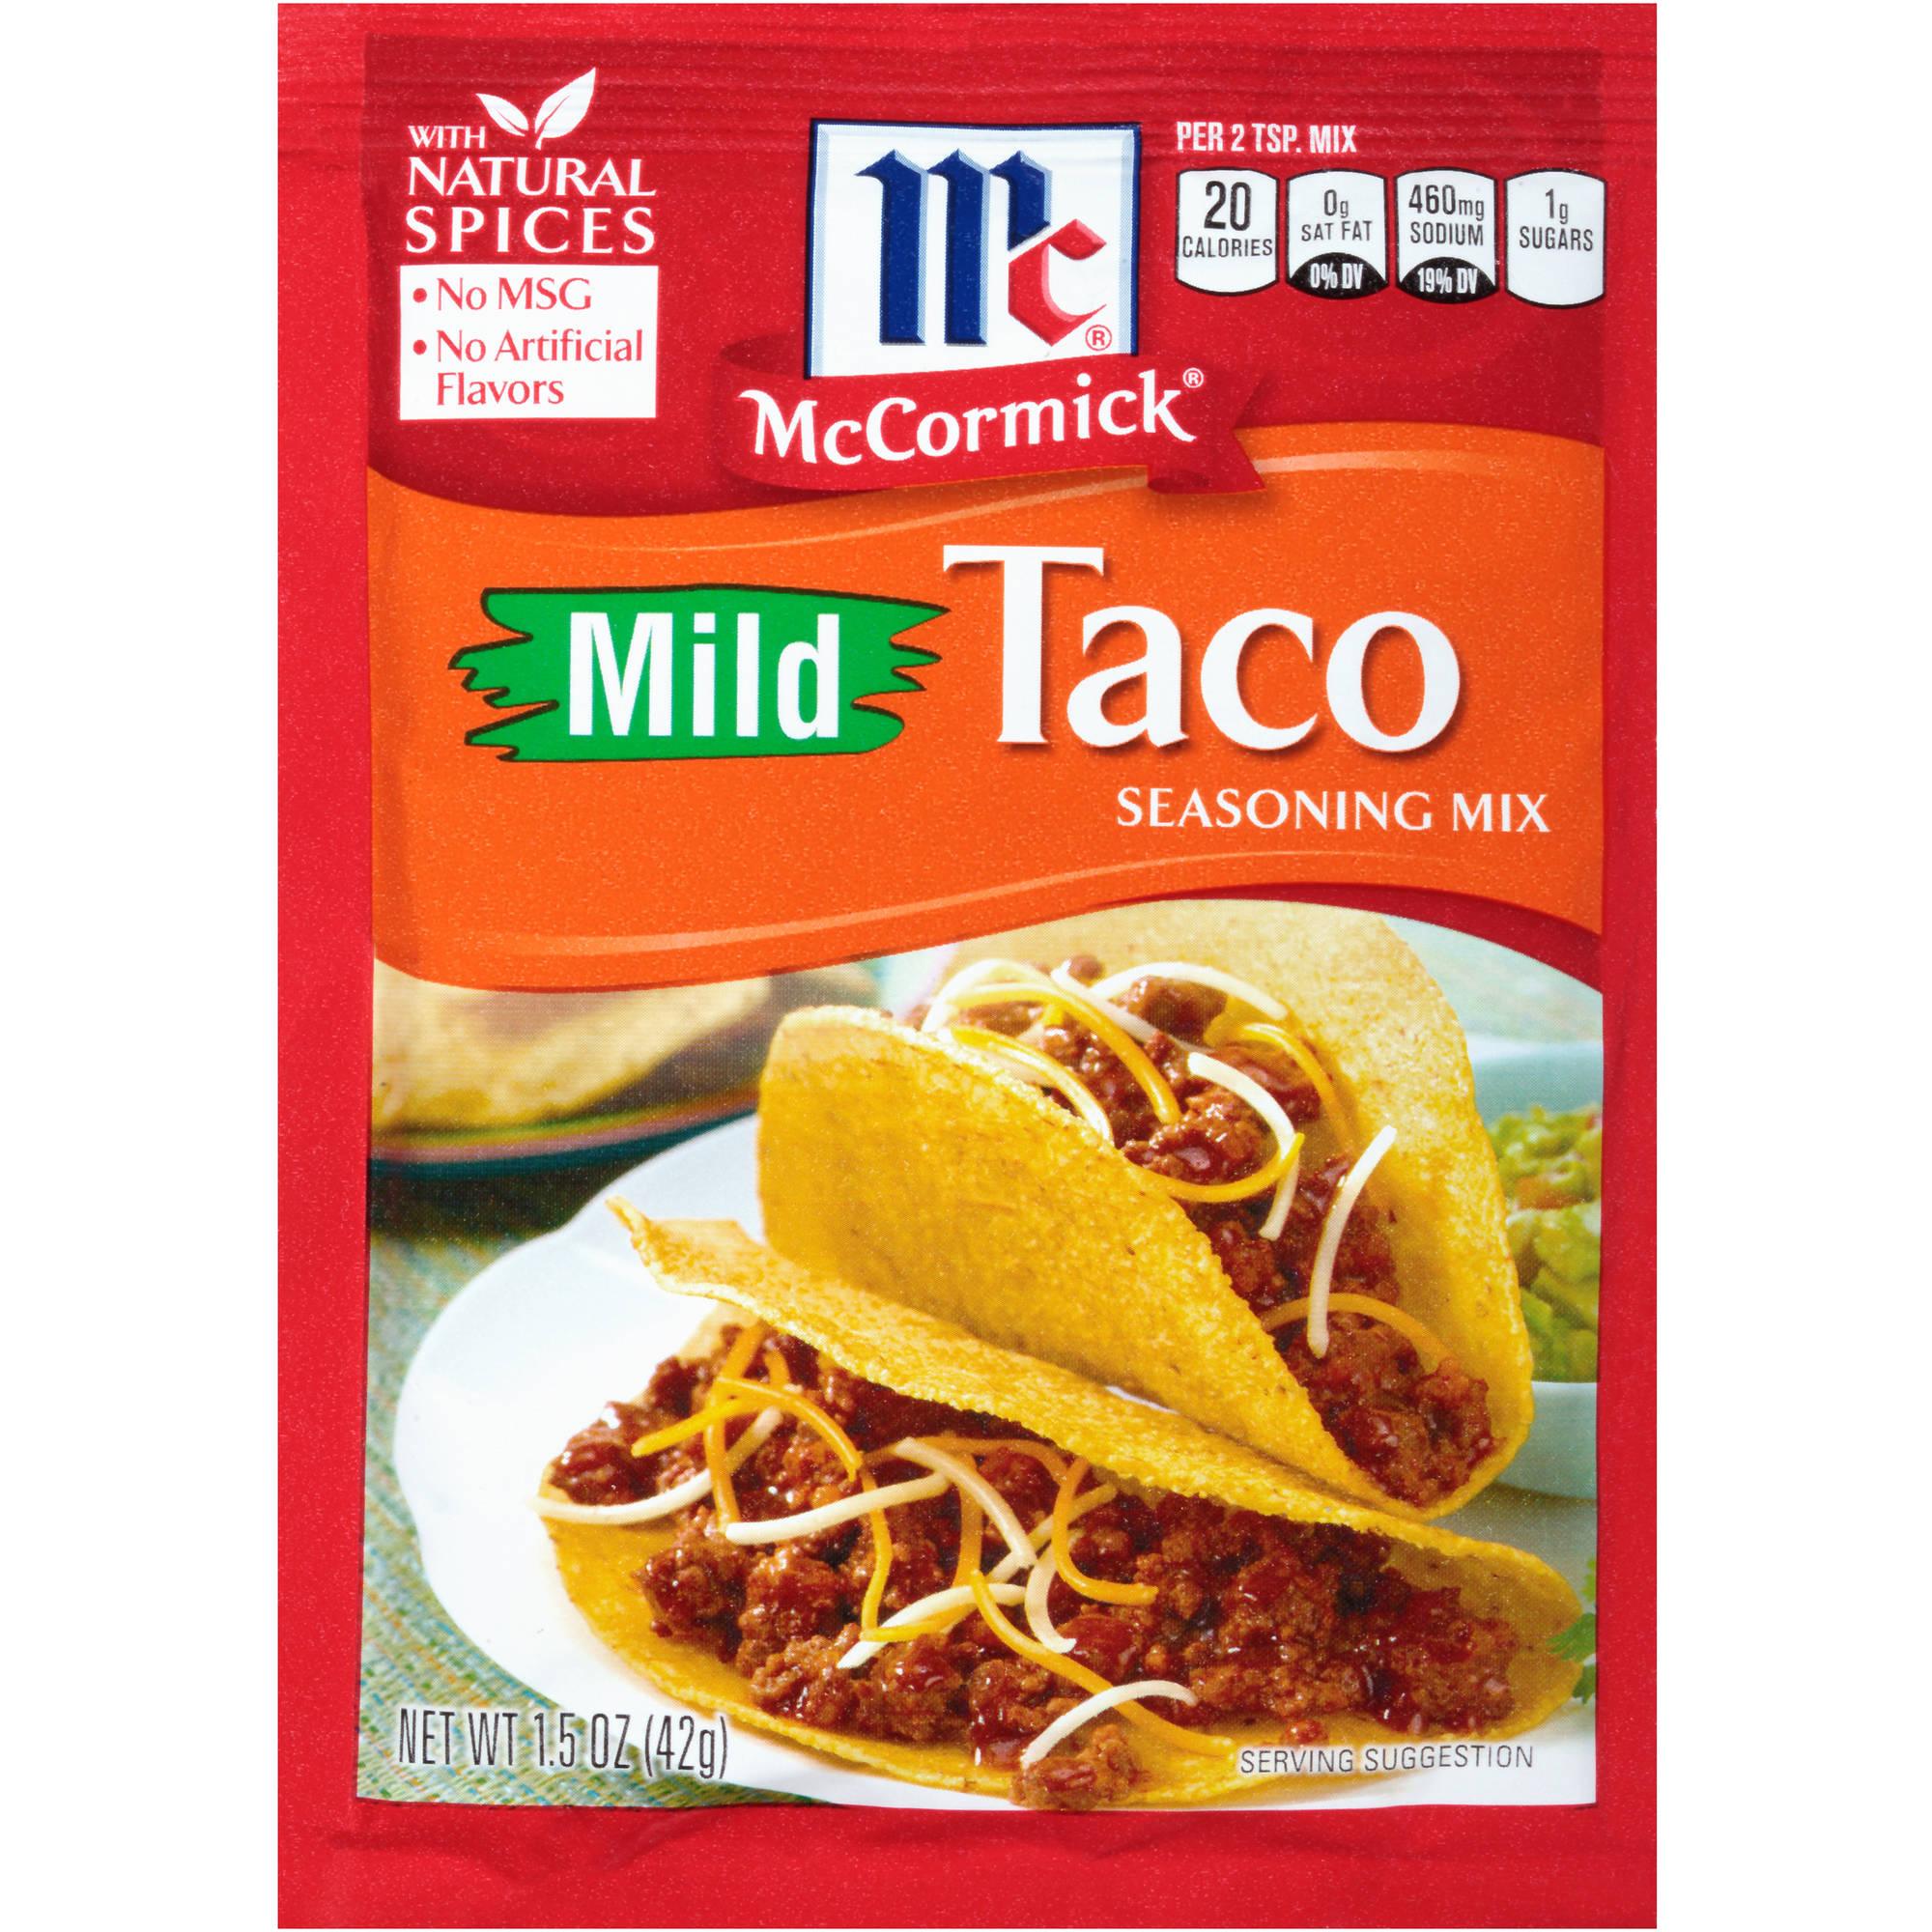 McCormick Mild Taco Seasoning Mix, 1.5 oz